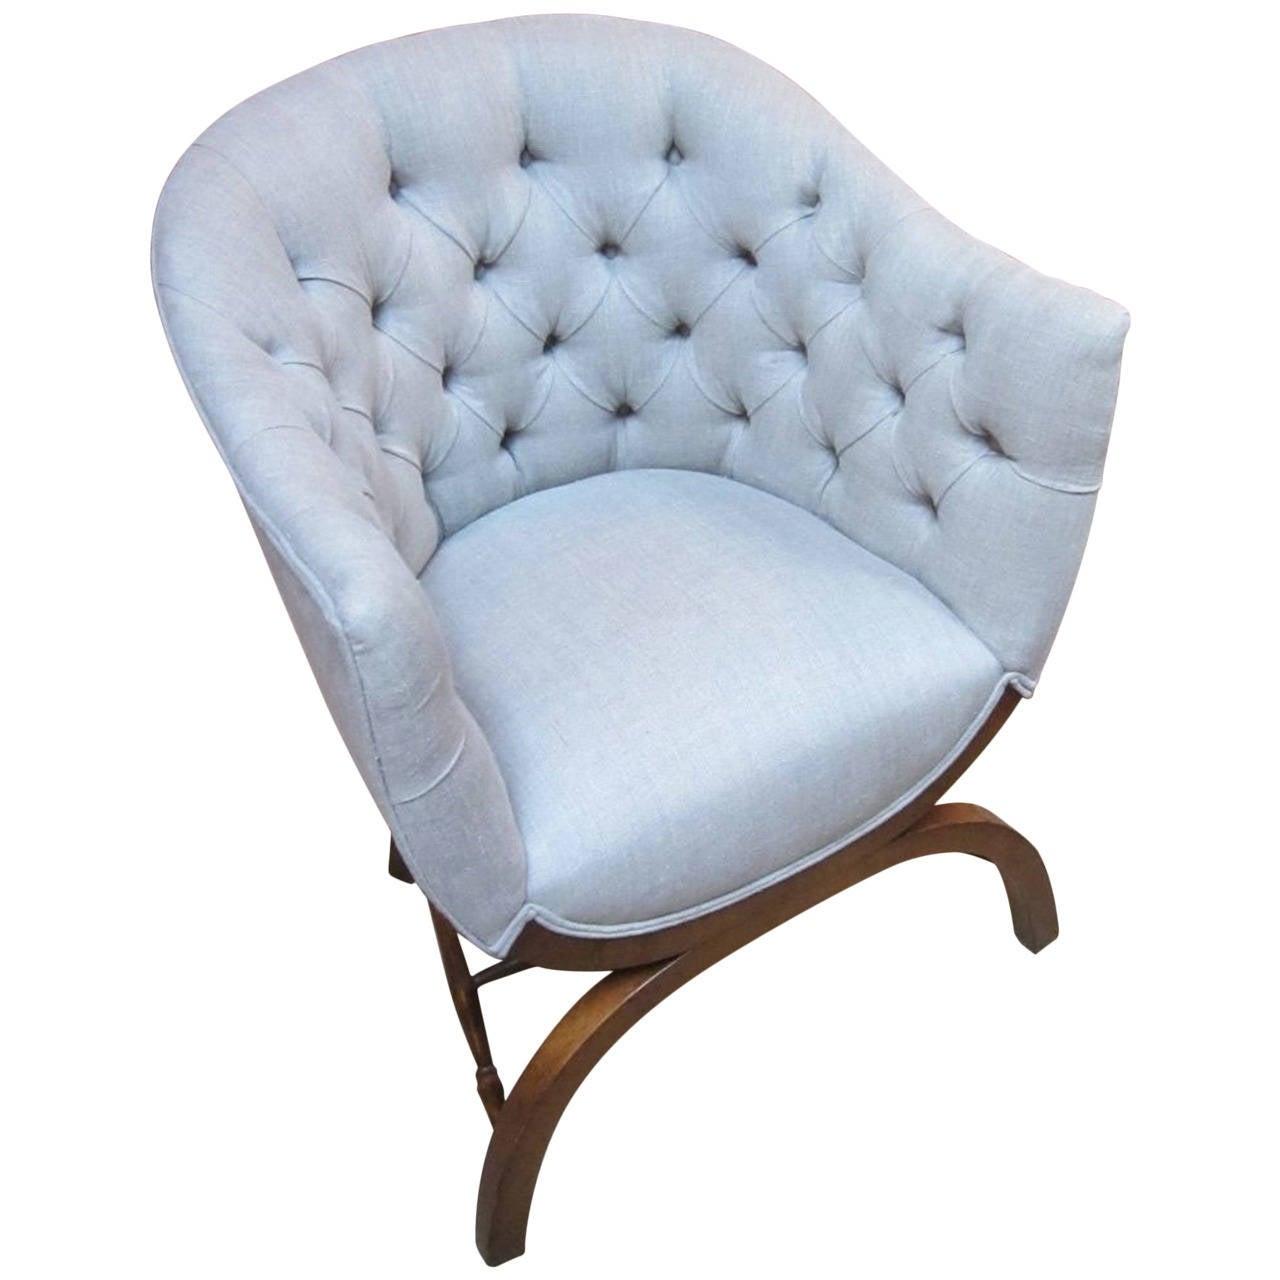 tufted desk chair vintage folding chairs 1281824 l jpeg